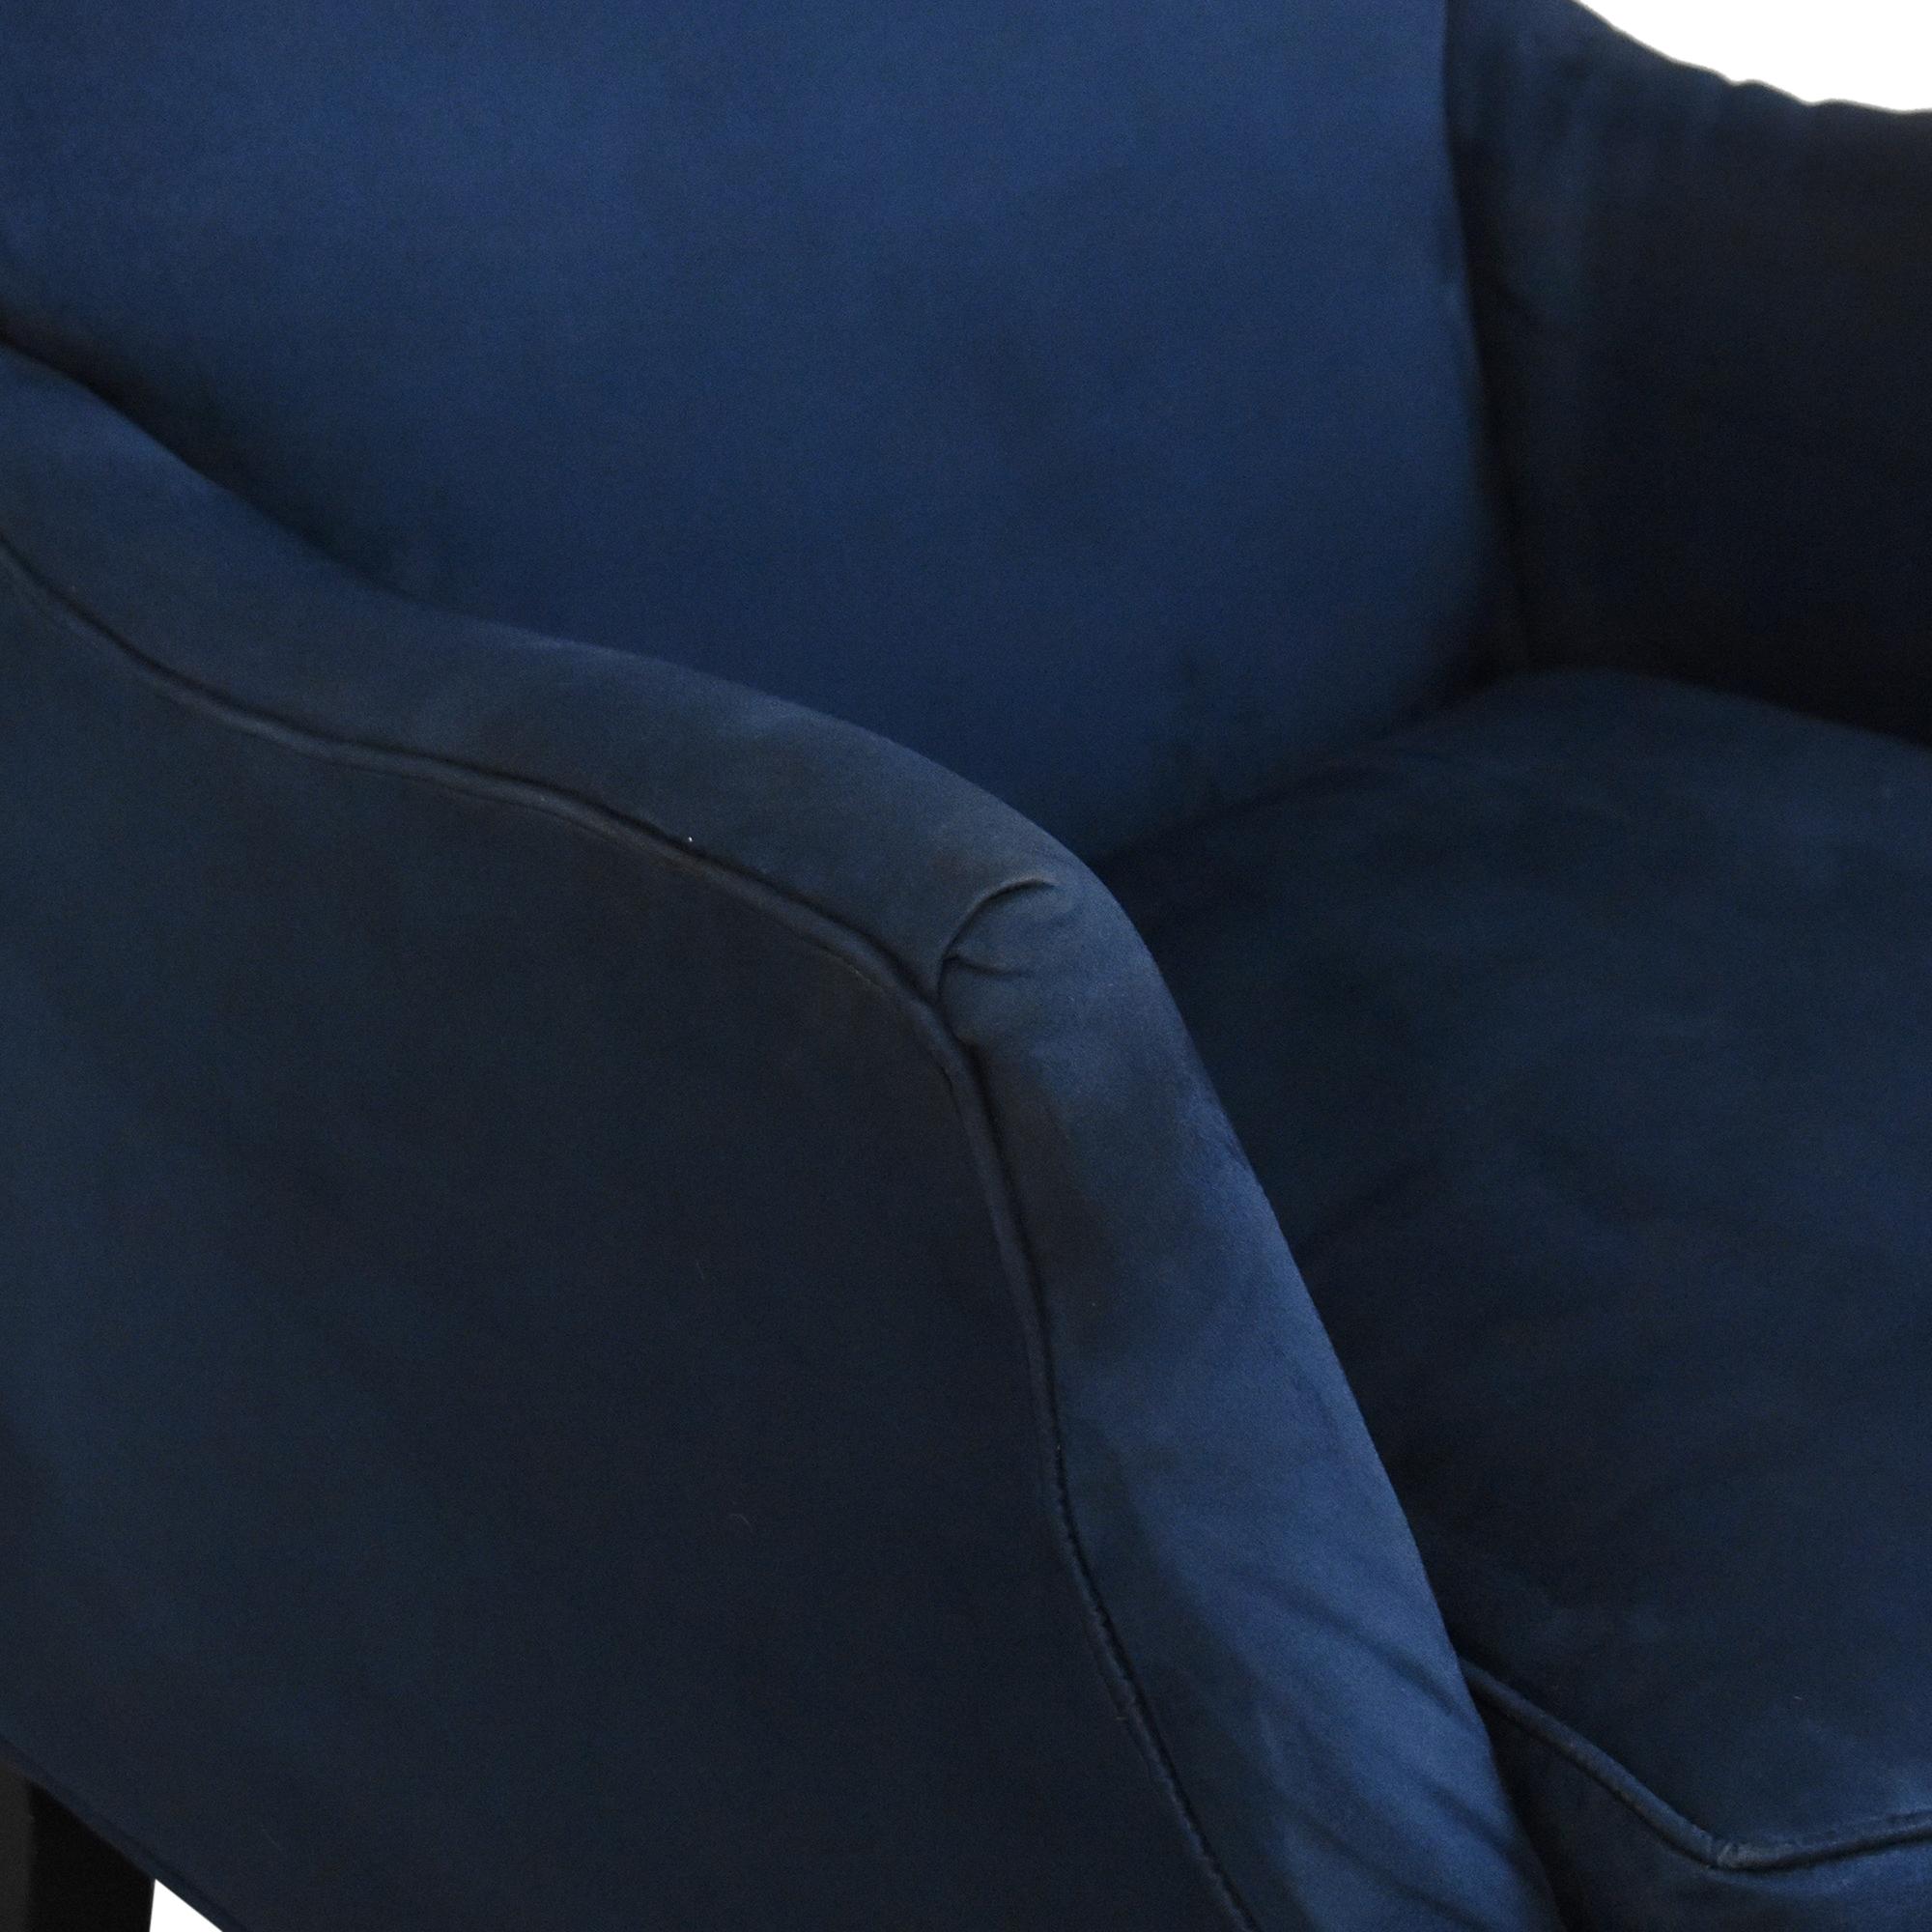 Ballard Designs Ballard Designs Accent Chair